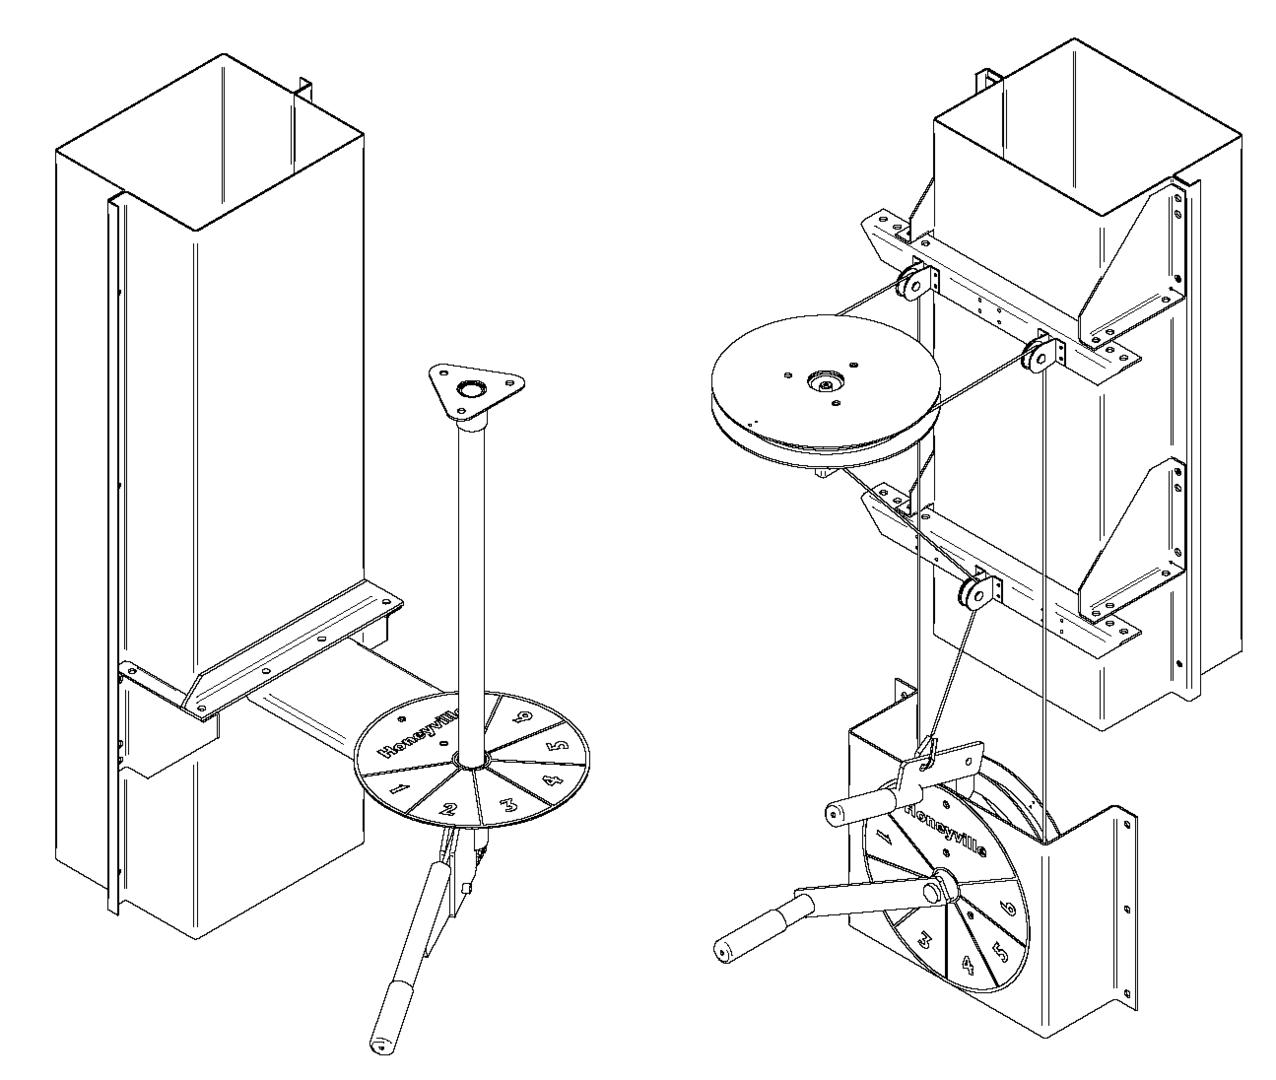 distributor drawing at getdrawings free for personal use SBC Distributor Diagram 1276x1080 distributors honeyville metal inc